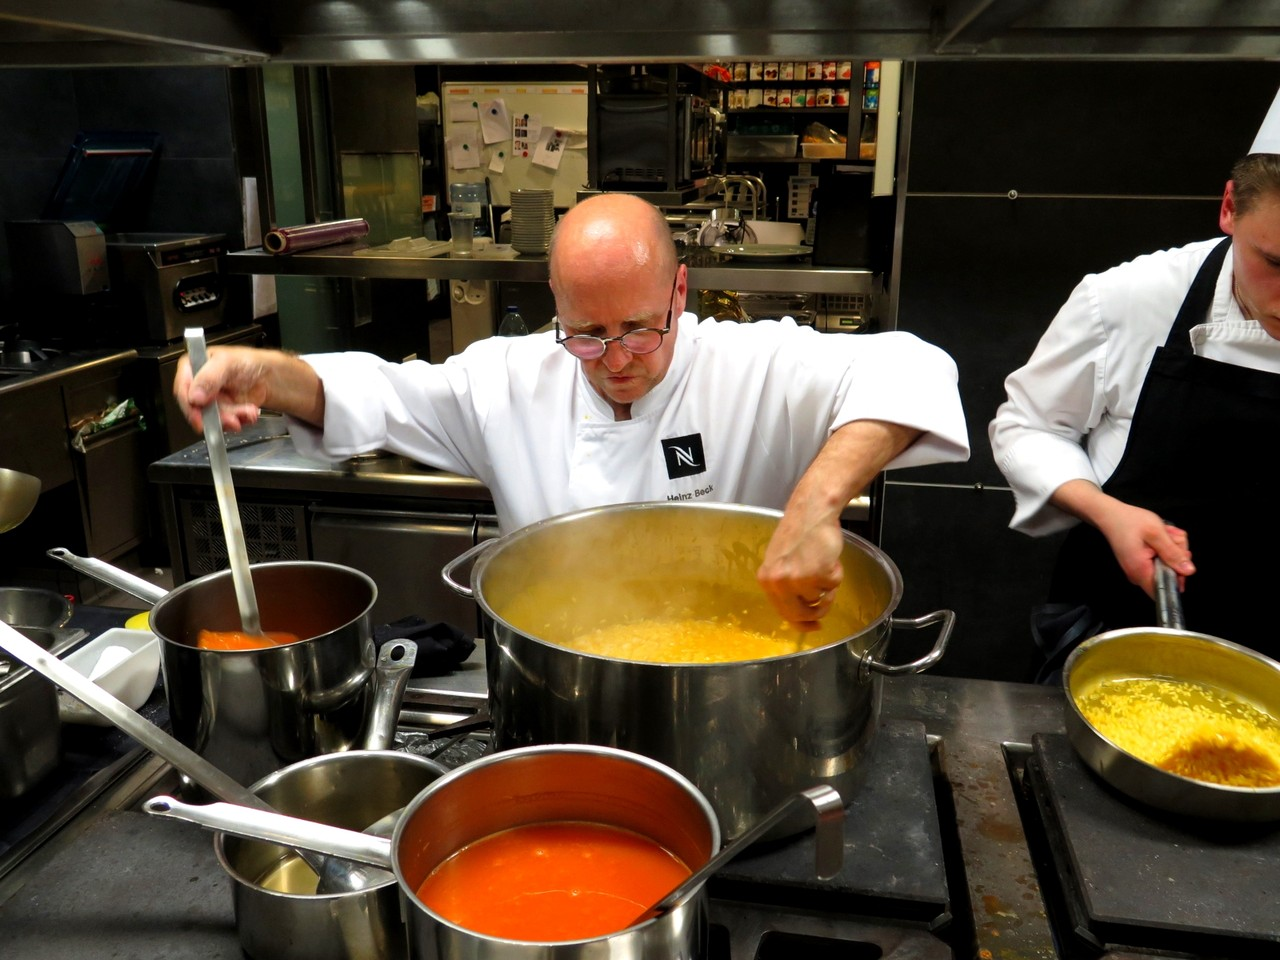 Heinz Beck e o risotto